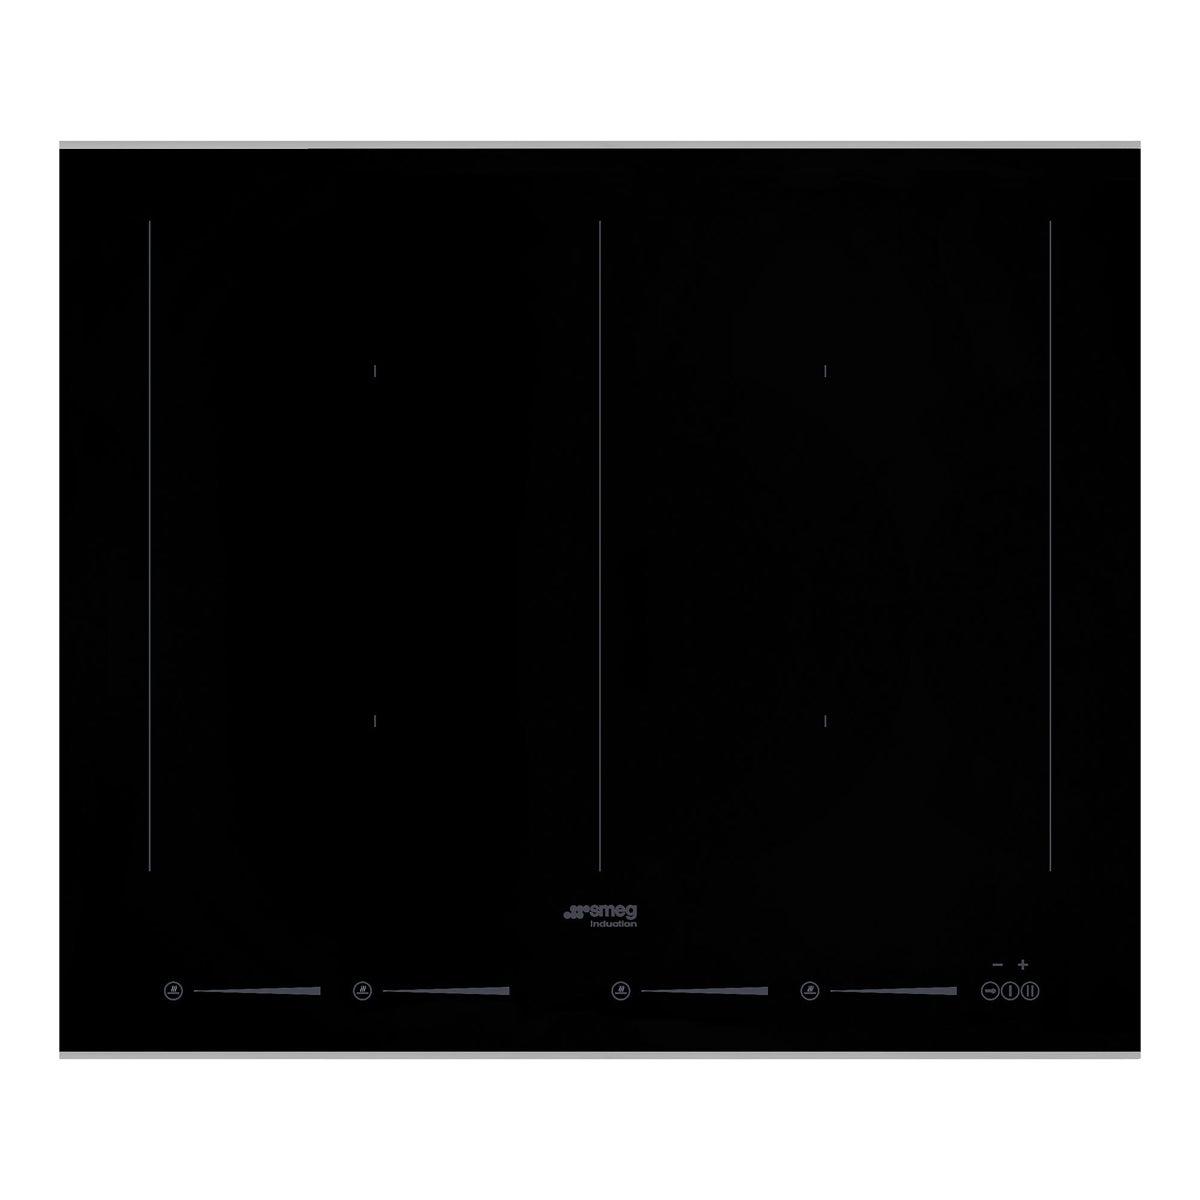 Smeg SIM662WLDX Kitchen Cooktop